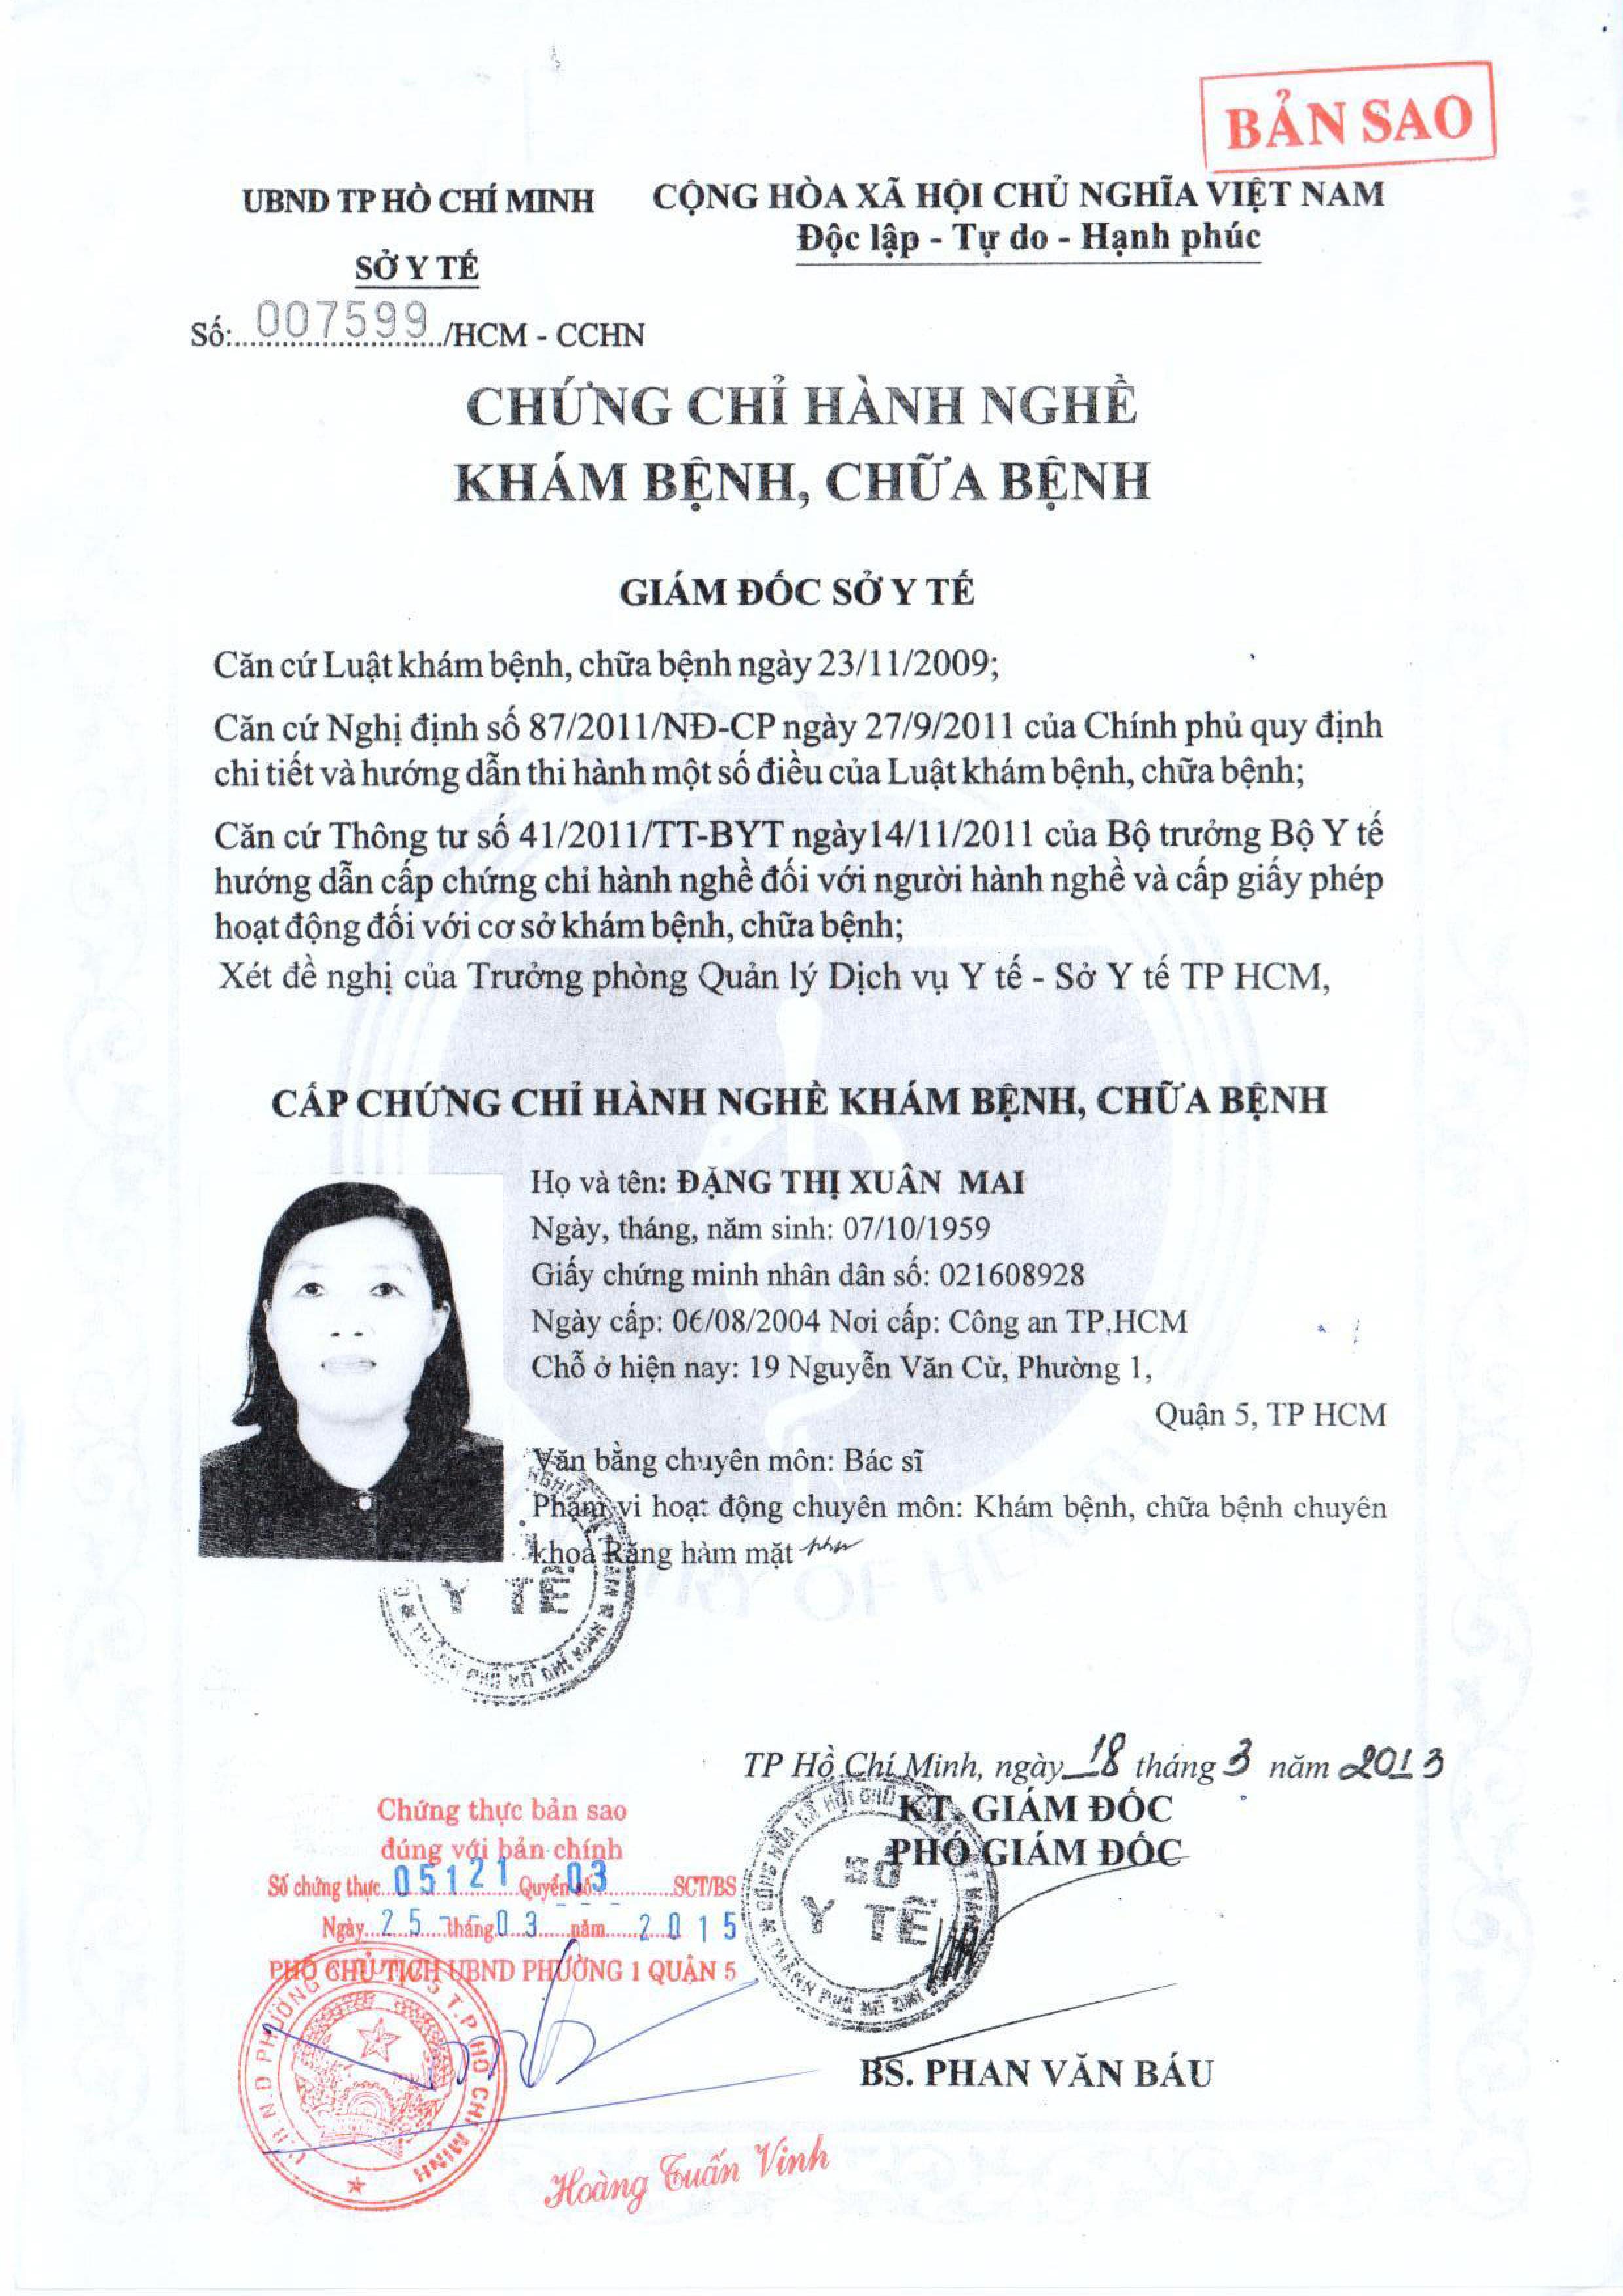 CCHN BS DANG THI XUAN MAI-taimuihongsg.jpg